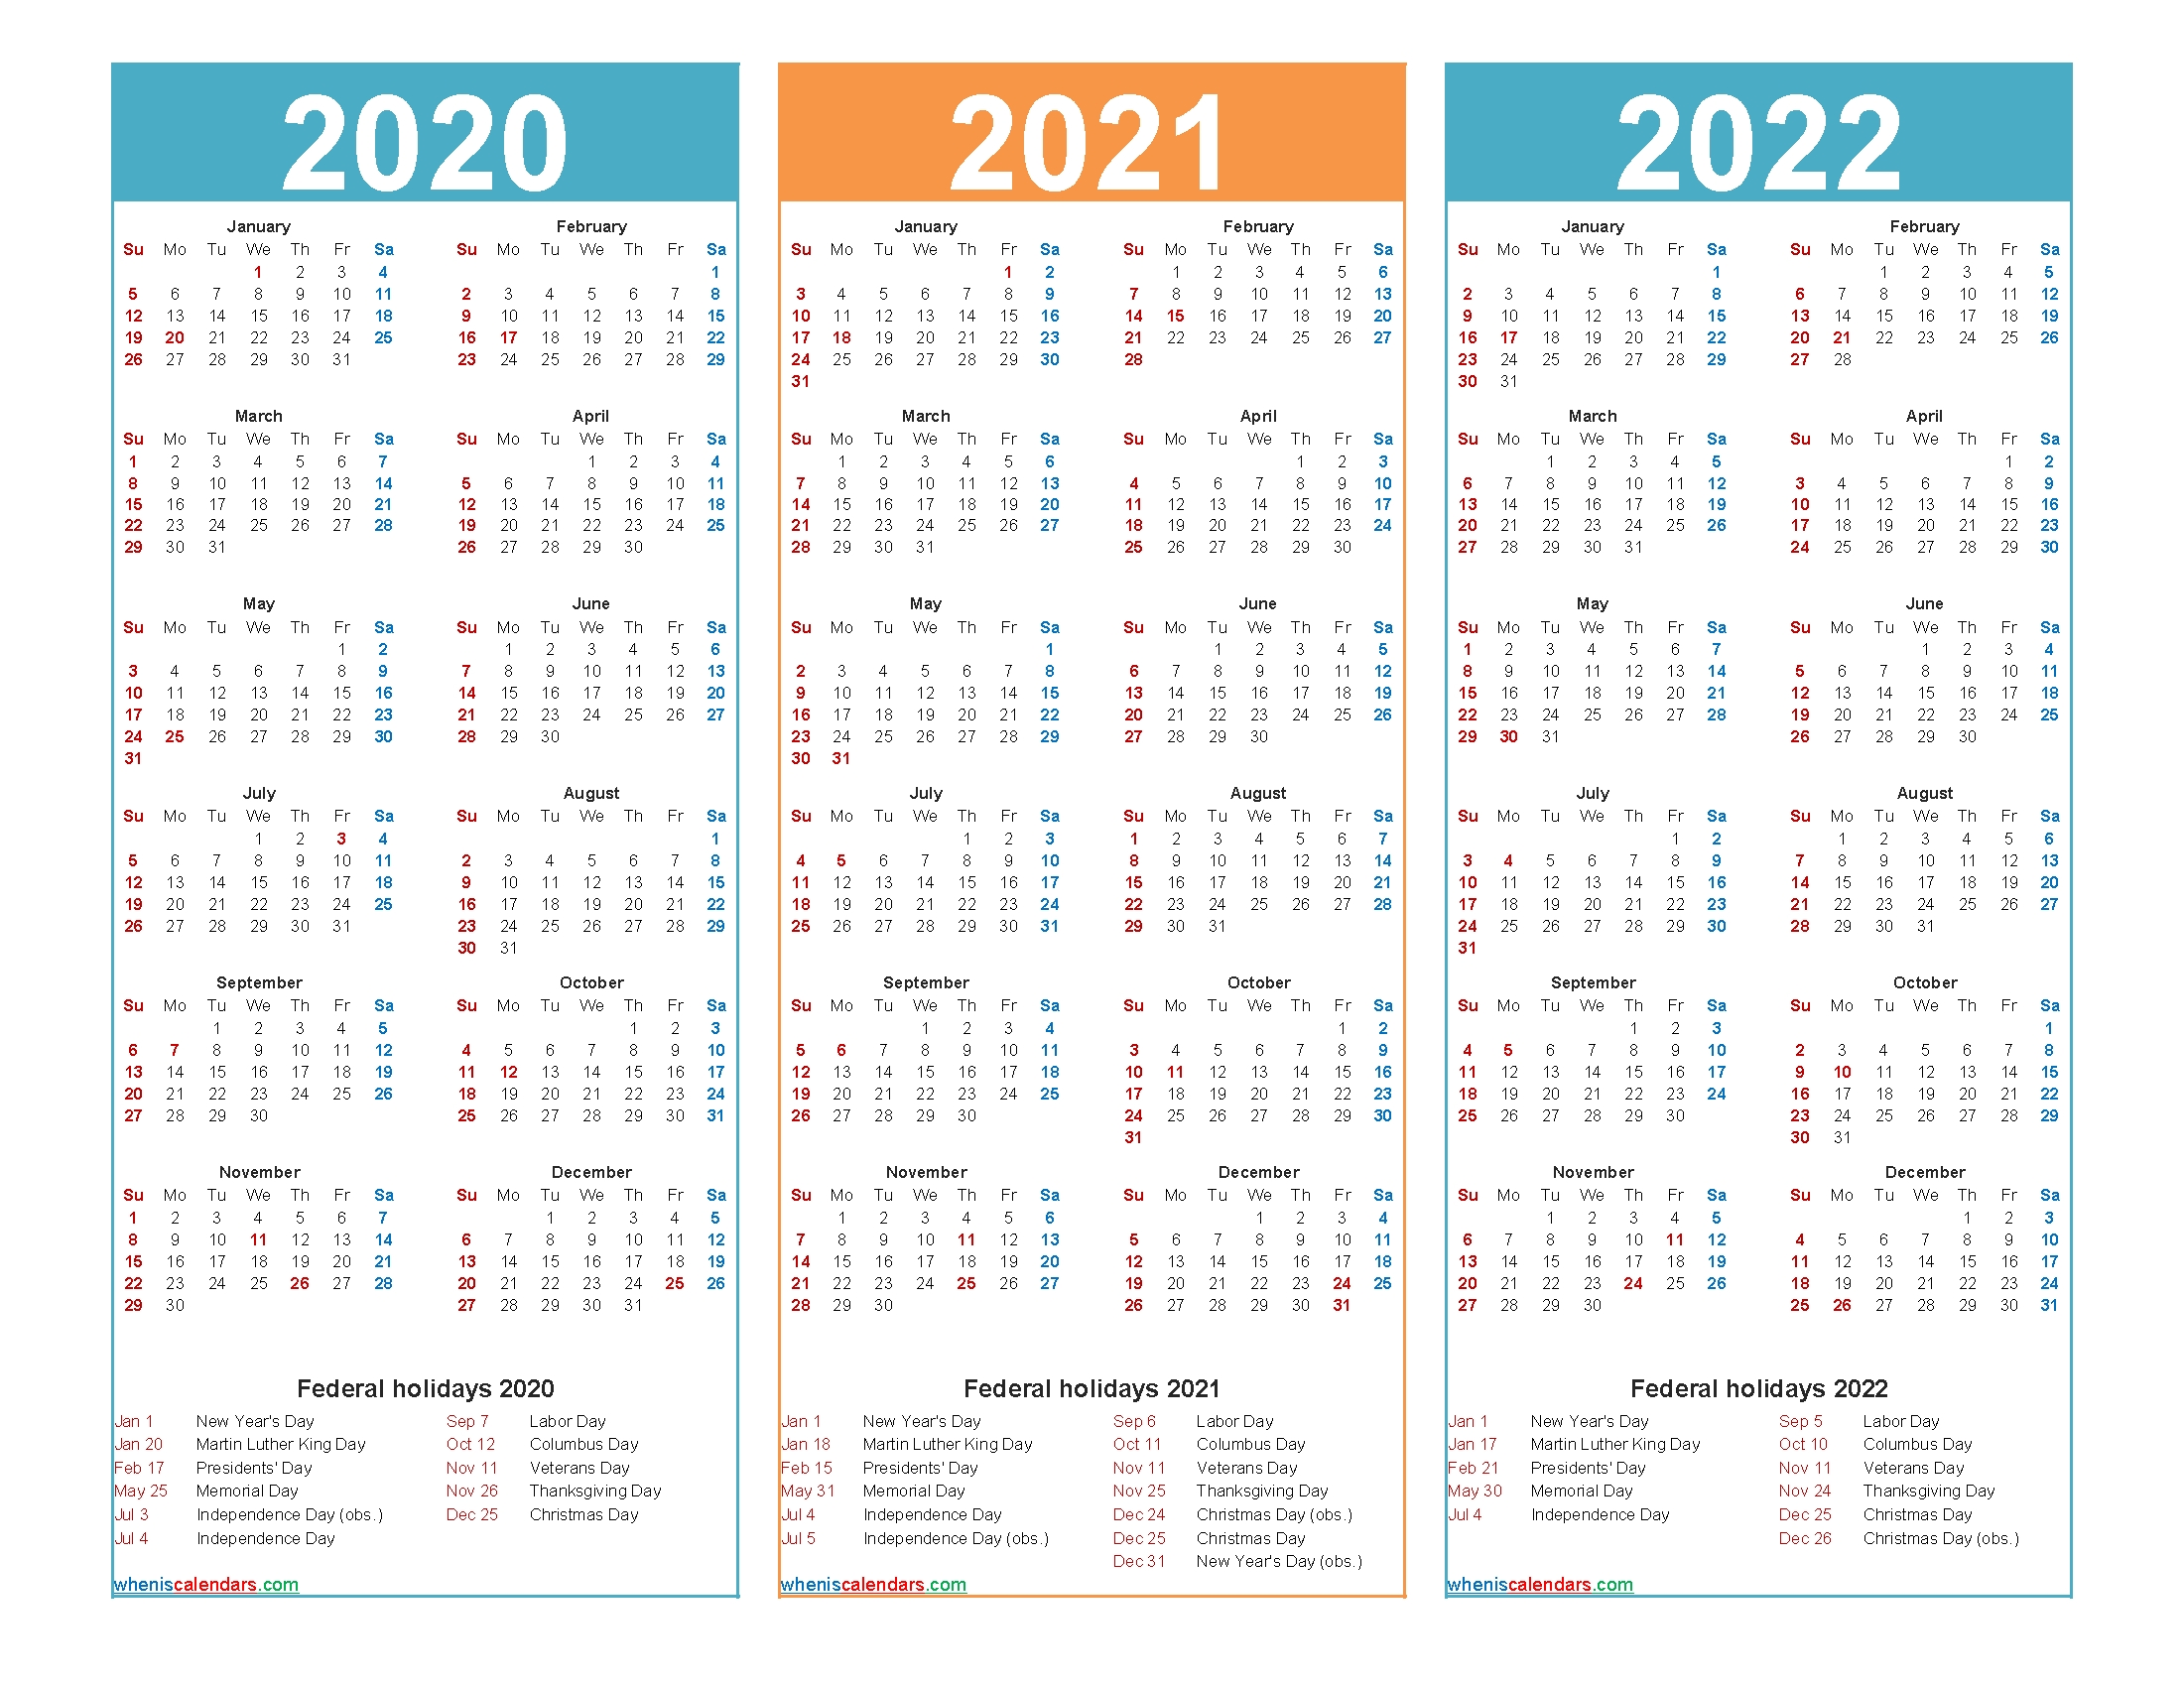 3 Year Calendar 2020 To 2022 Printable | Free Printable 2020 with regard to 2020 2021 2022 2023 Calendar Printable One Page